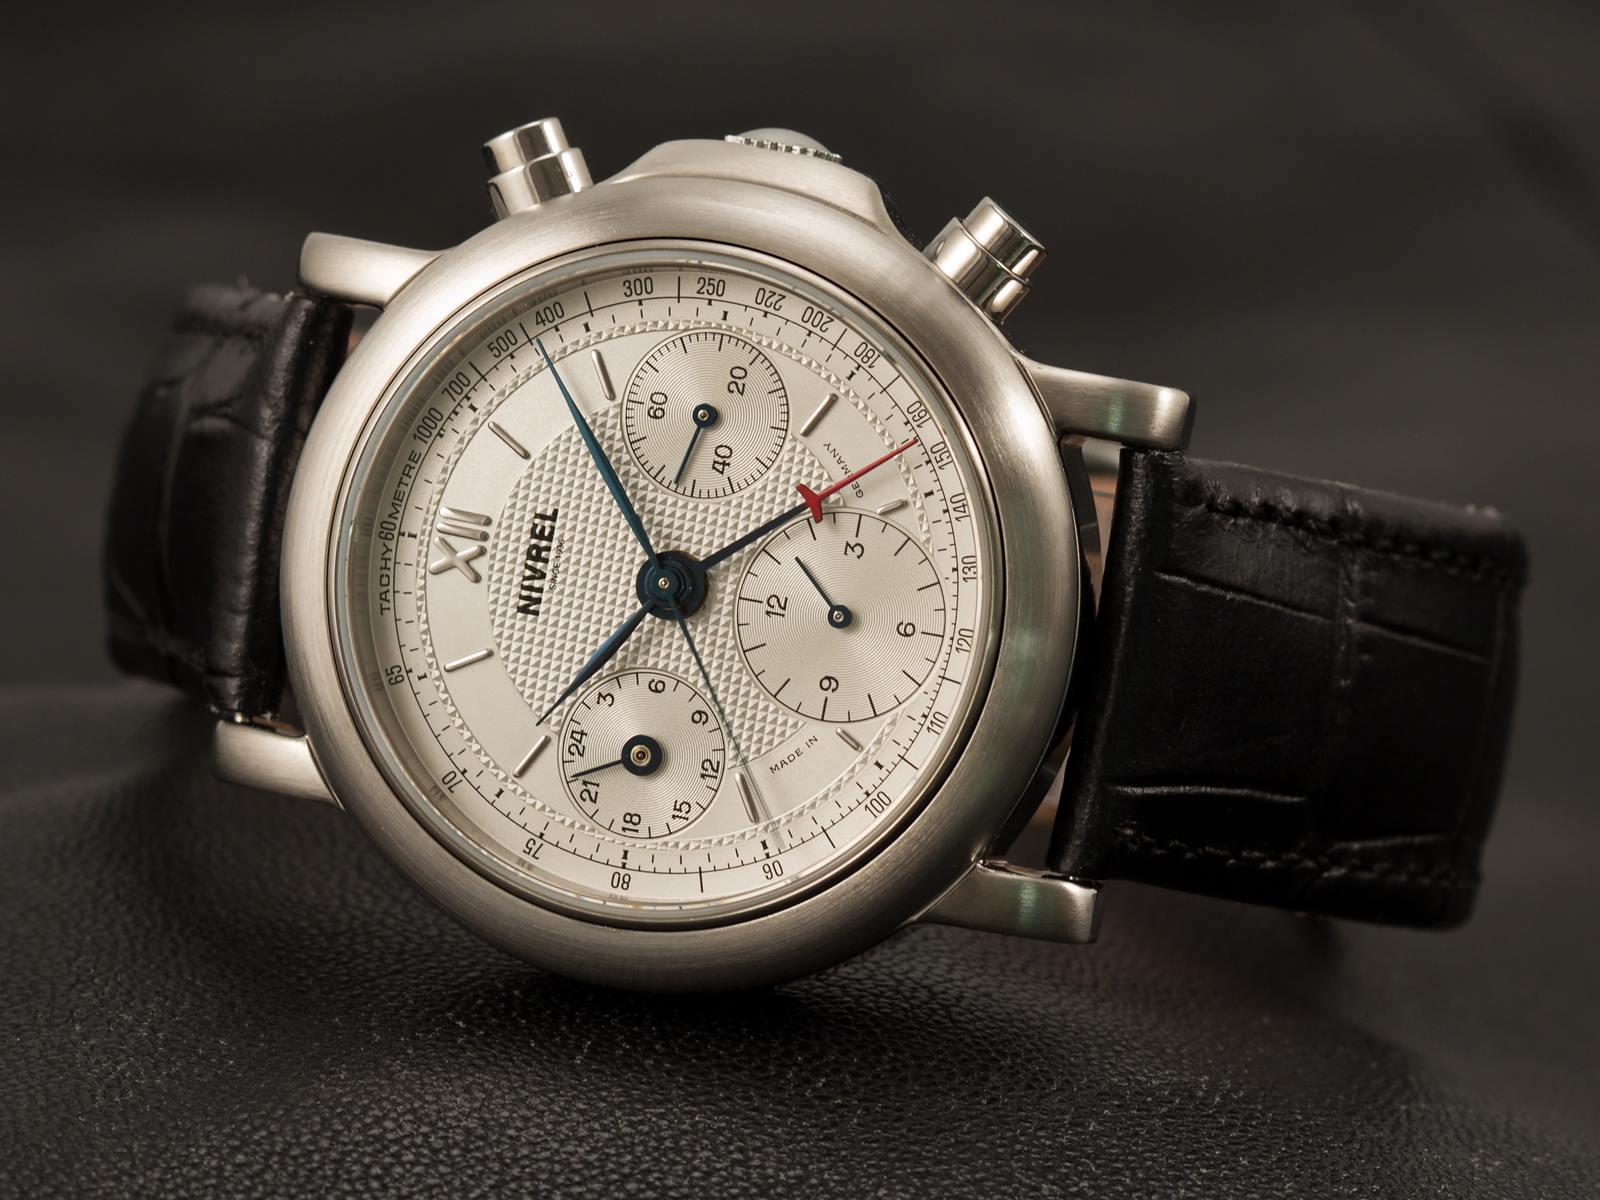 Naziv: Nivrel-Heritage-Chronographe-Minutes-satovi-1.jpg, pregleda: 107, veličina: 193,8 KB